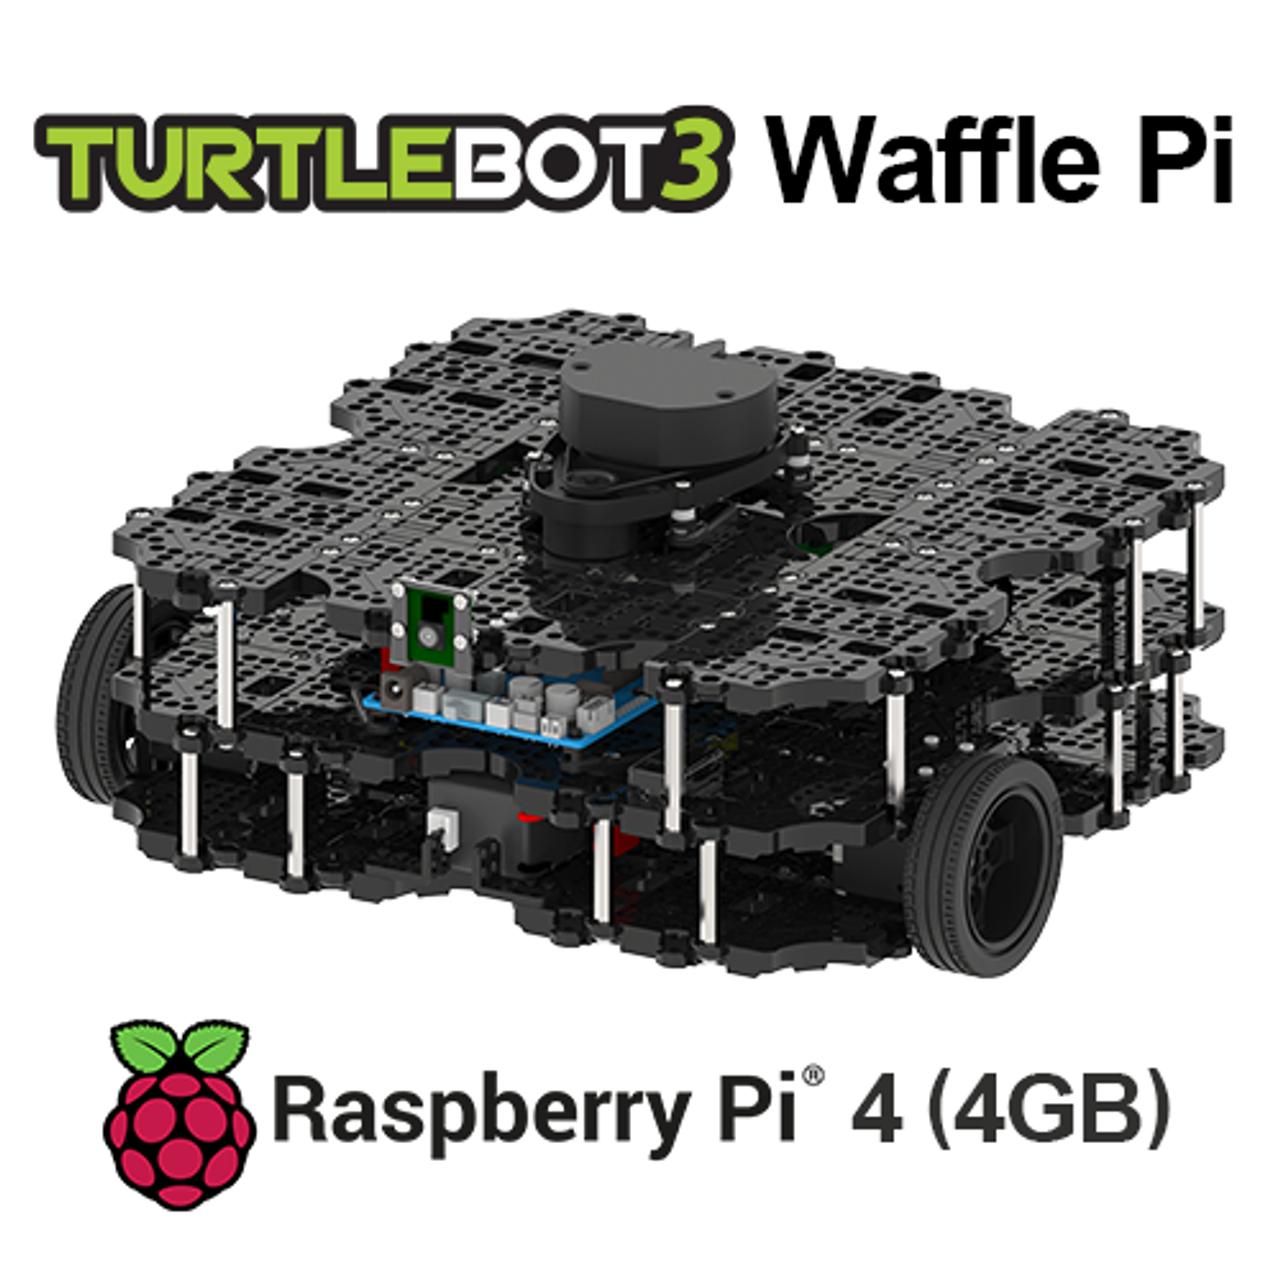 TurtleBot 3 Waffle Pi RPi4 4GB [US]